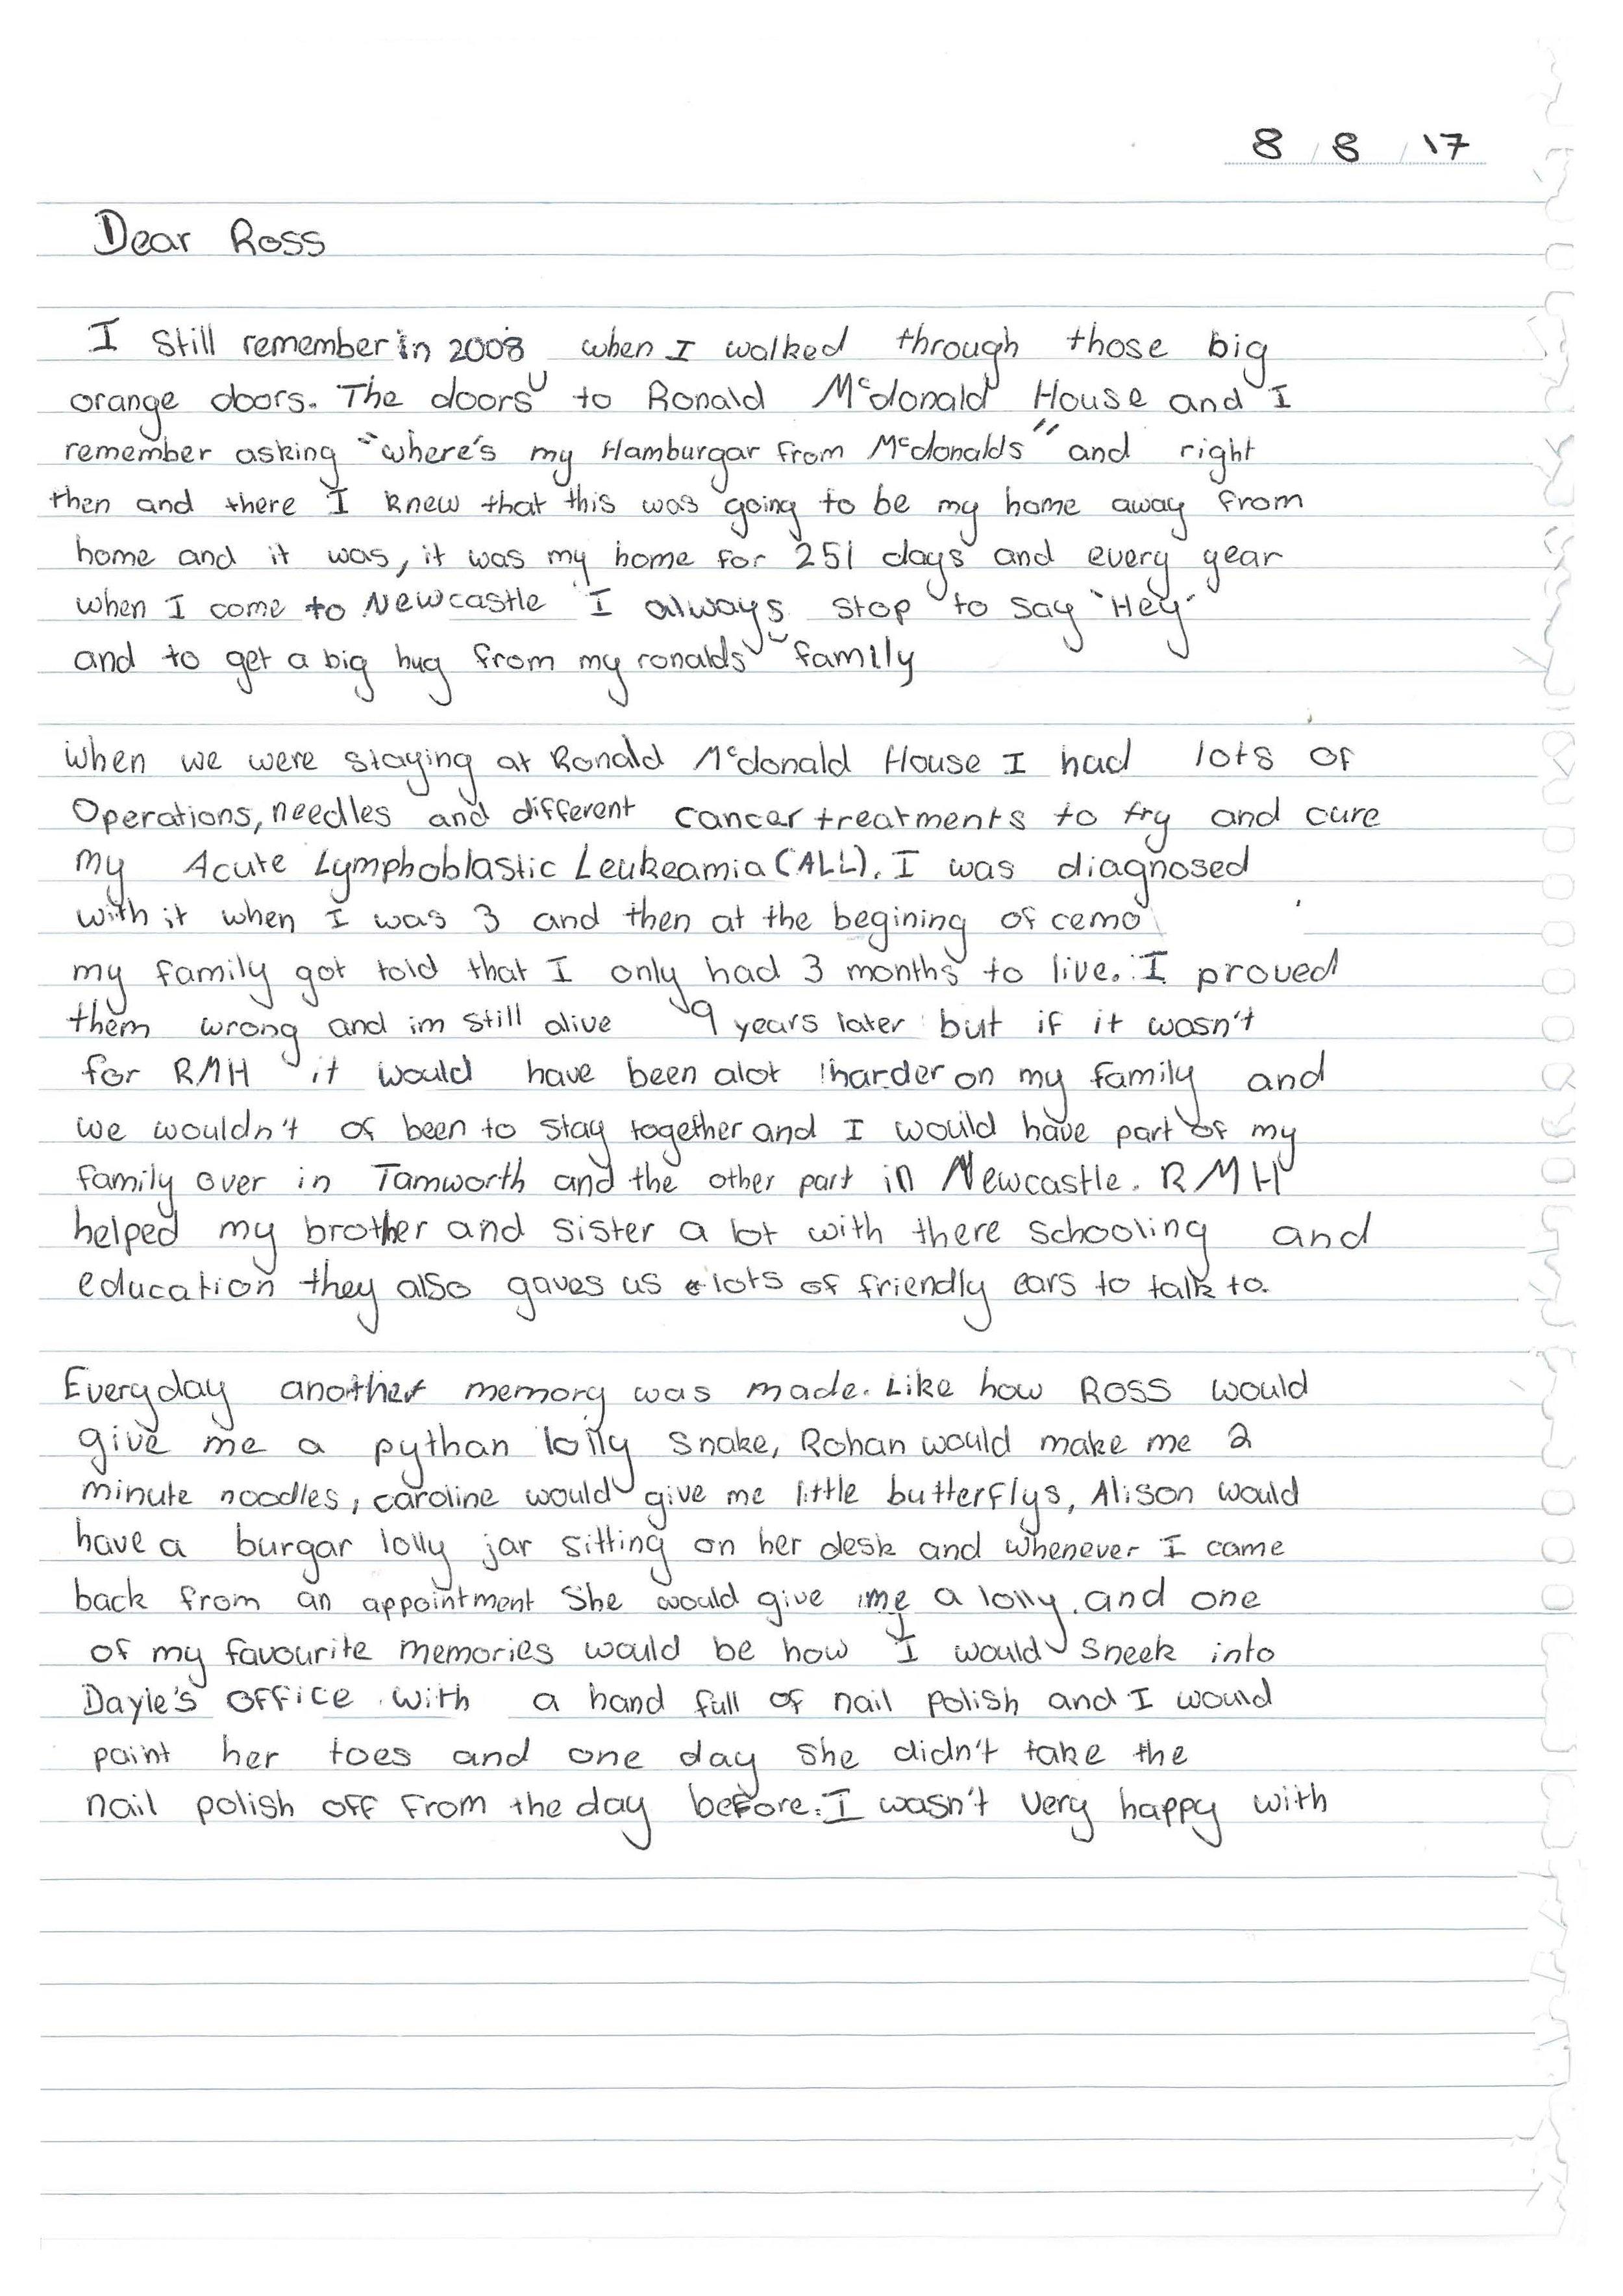 Georgia Smith writes to Ross_Page_1.jpg